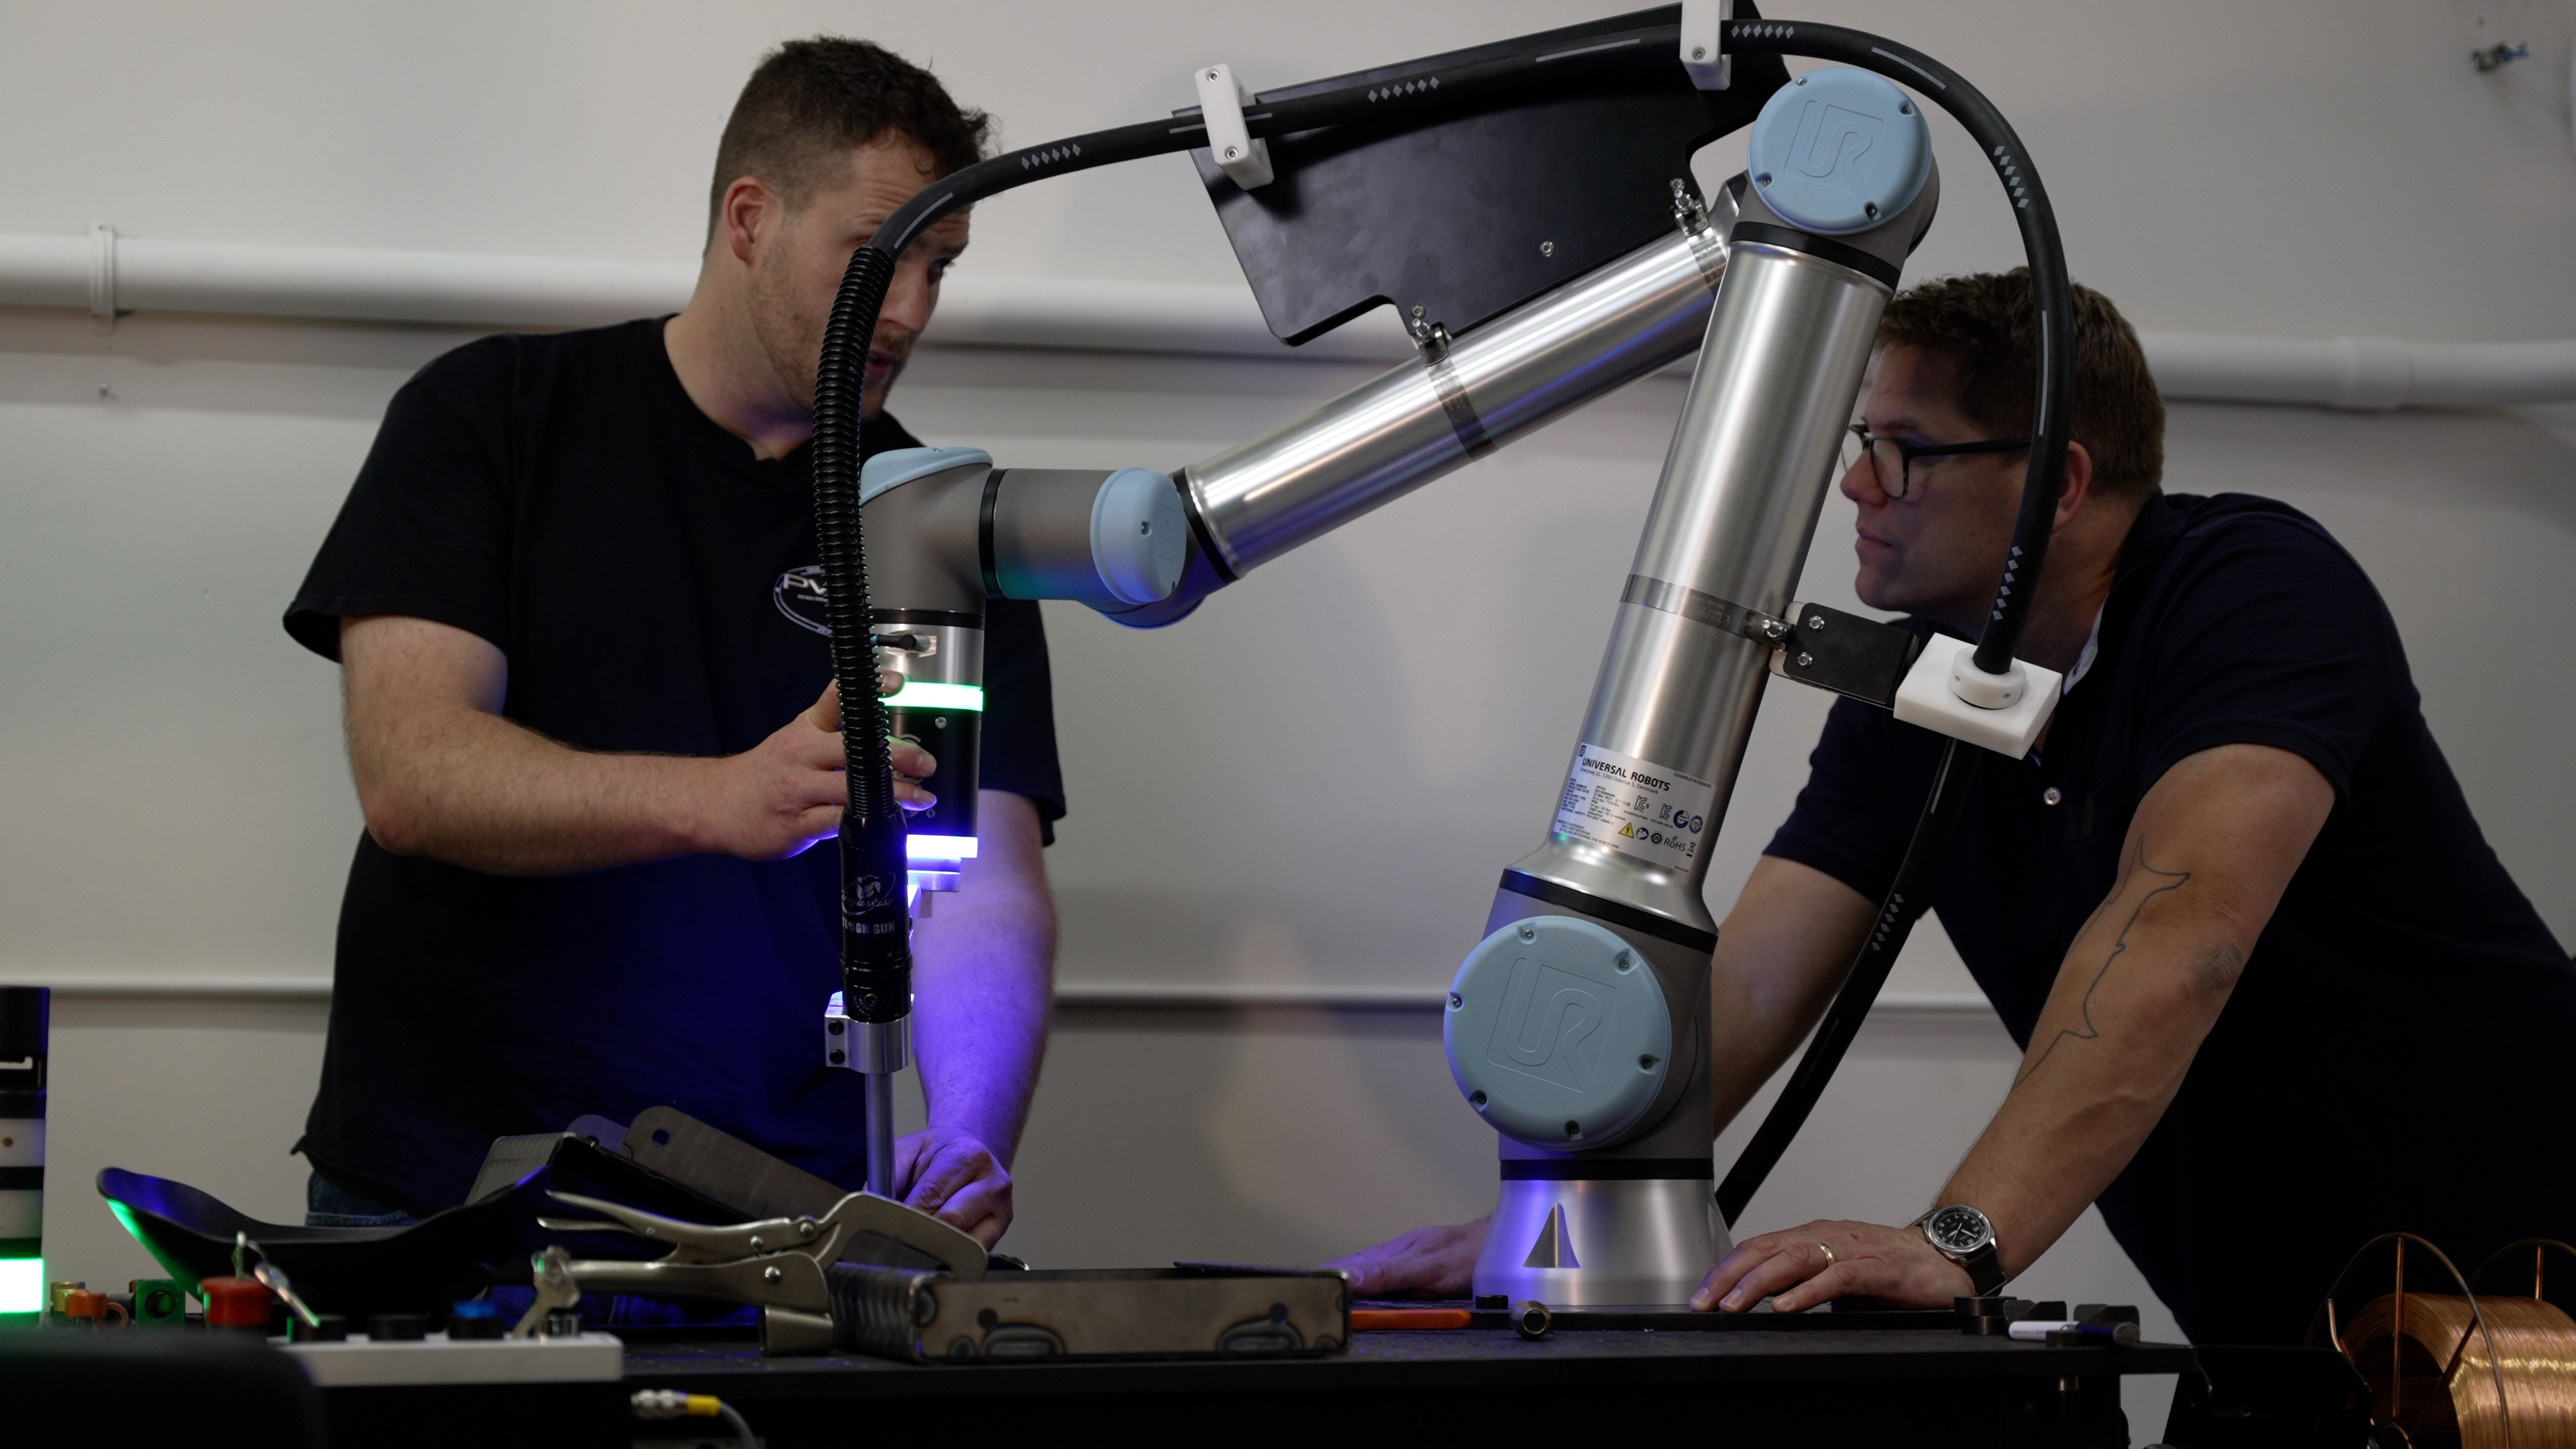 cobot_welder_welding_cobot_robot